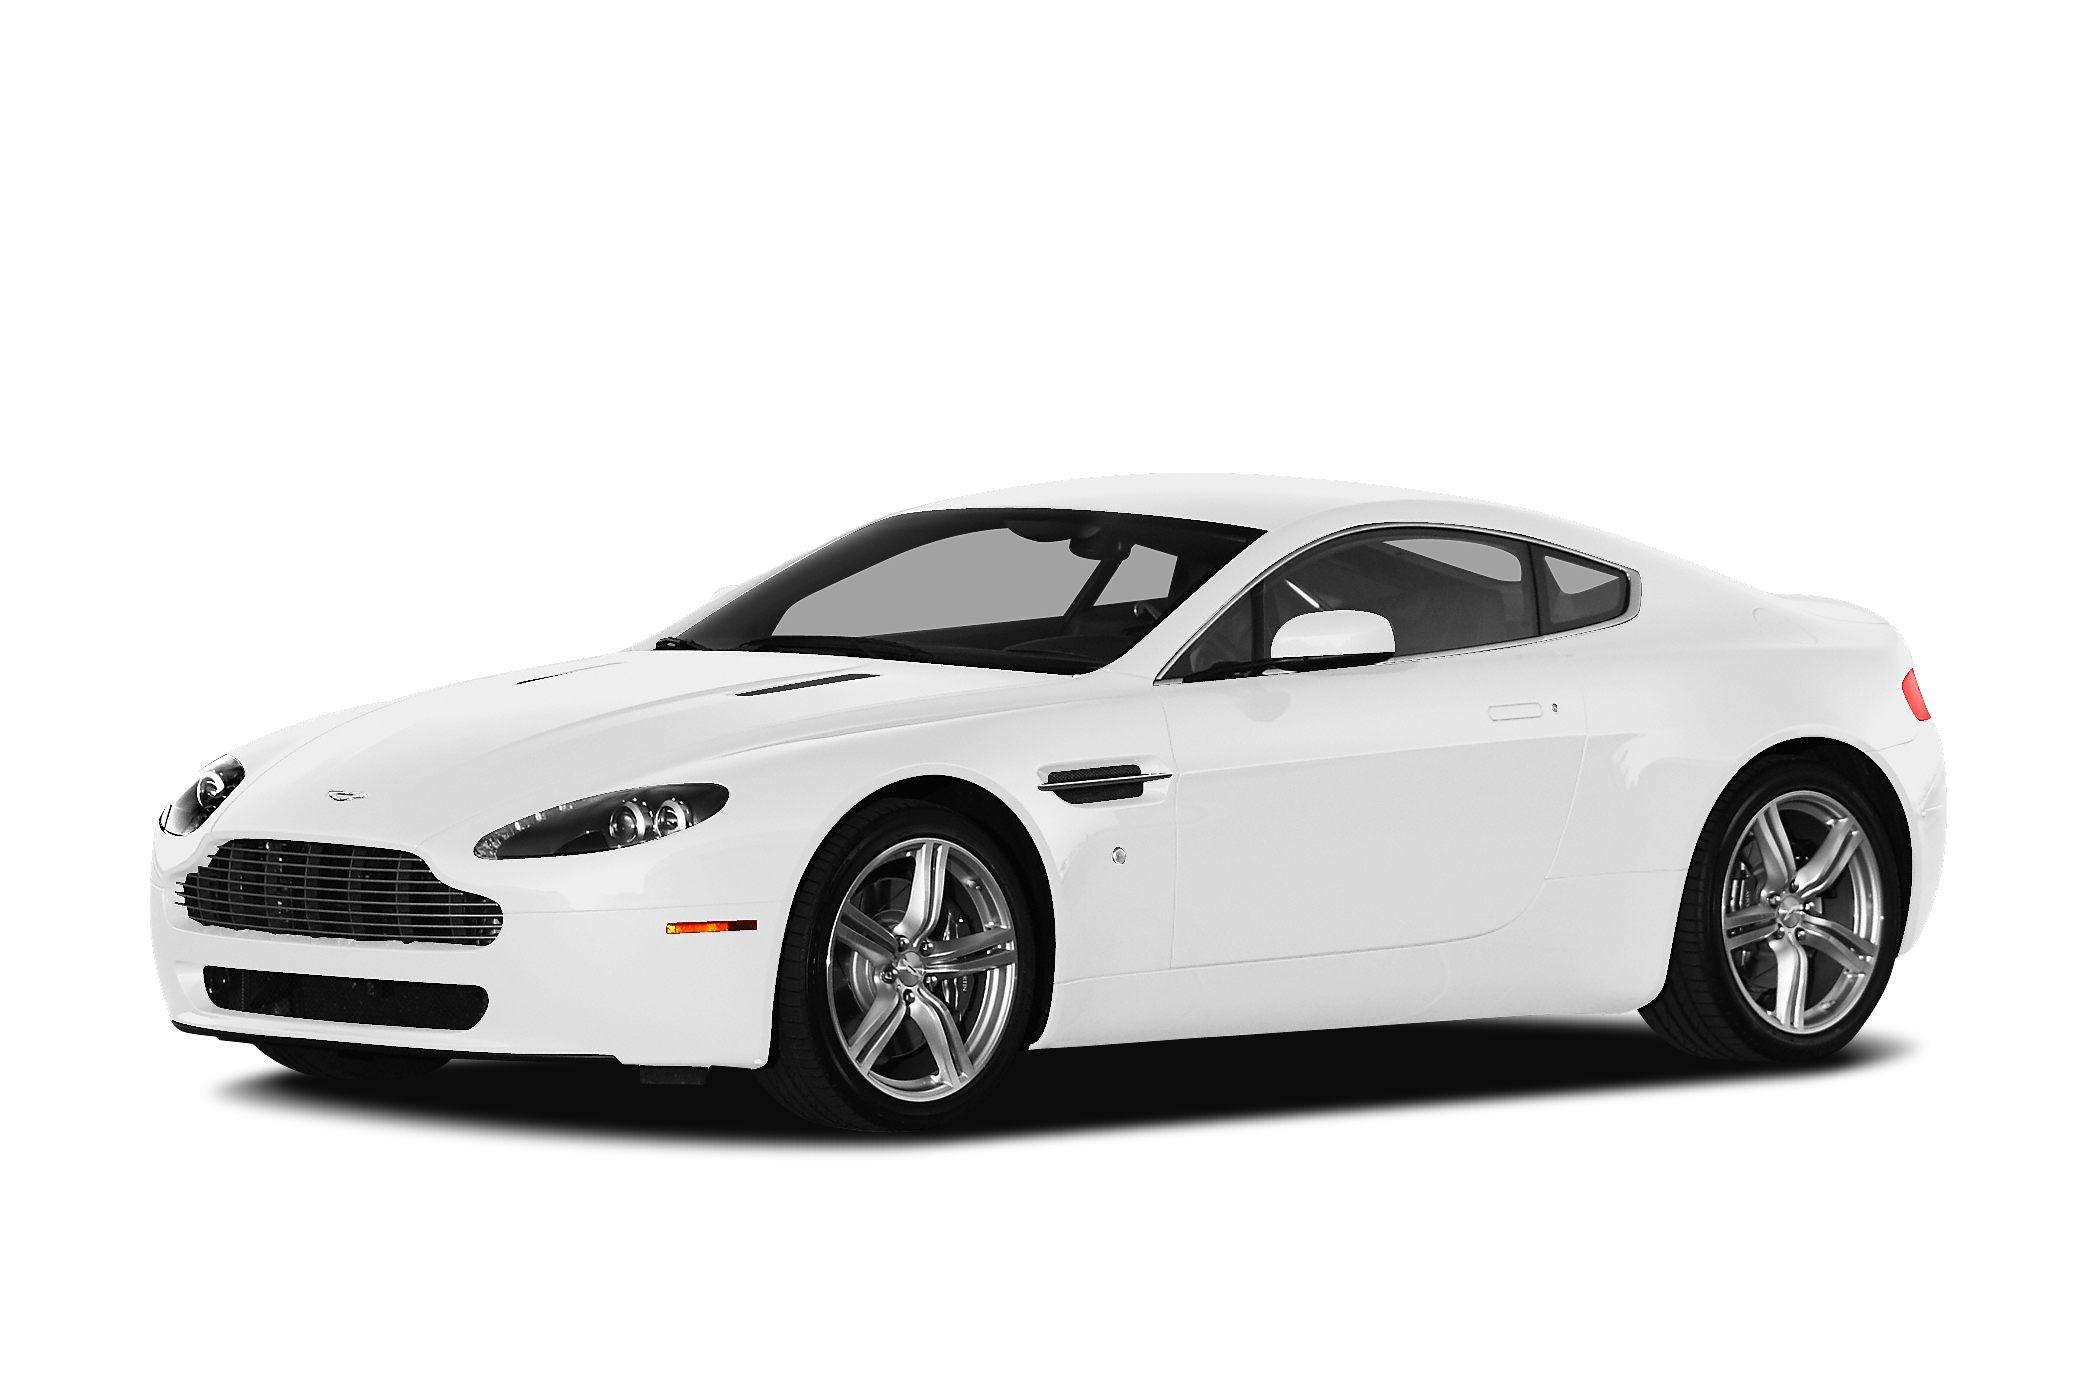 2009 Aston Martin V8 Vantage Specs And Prices